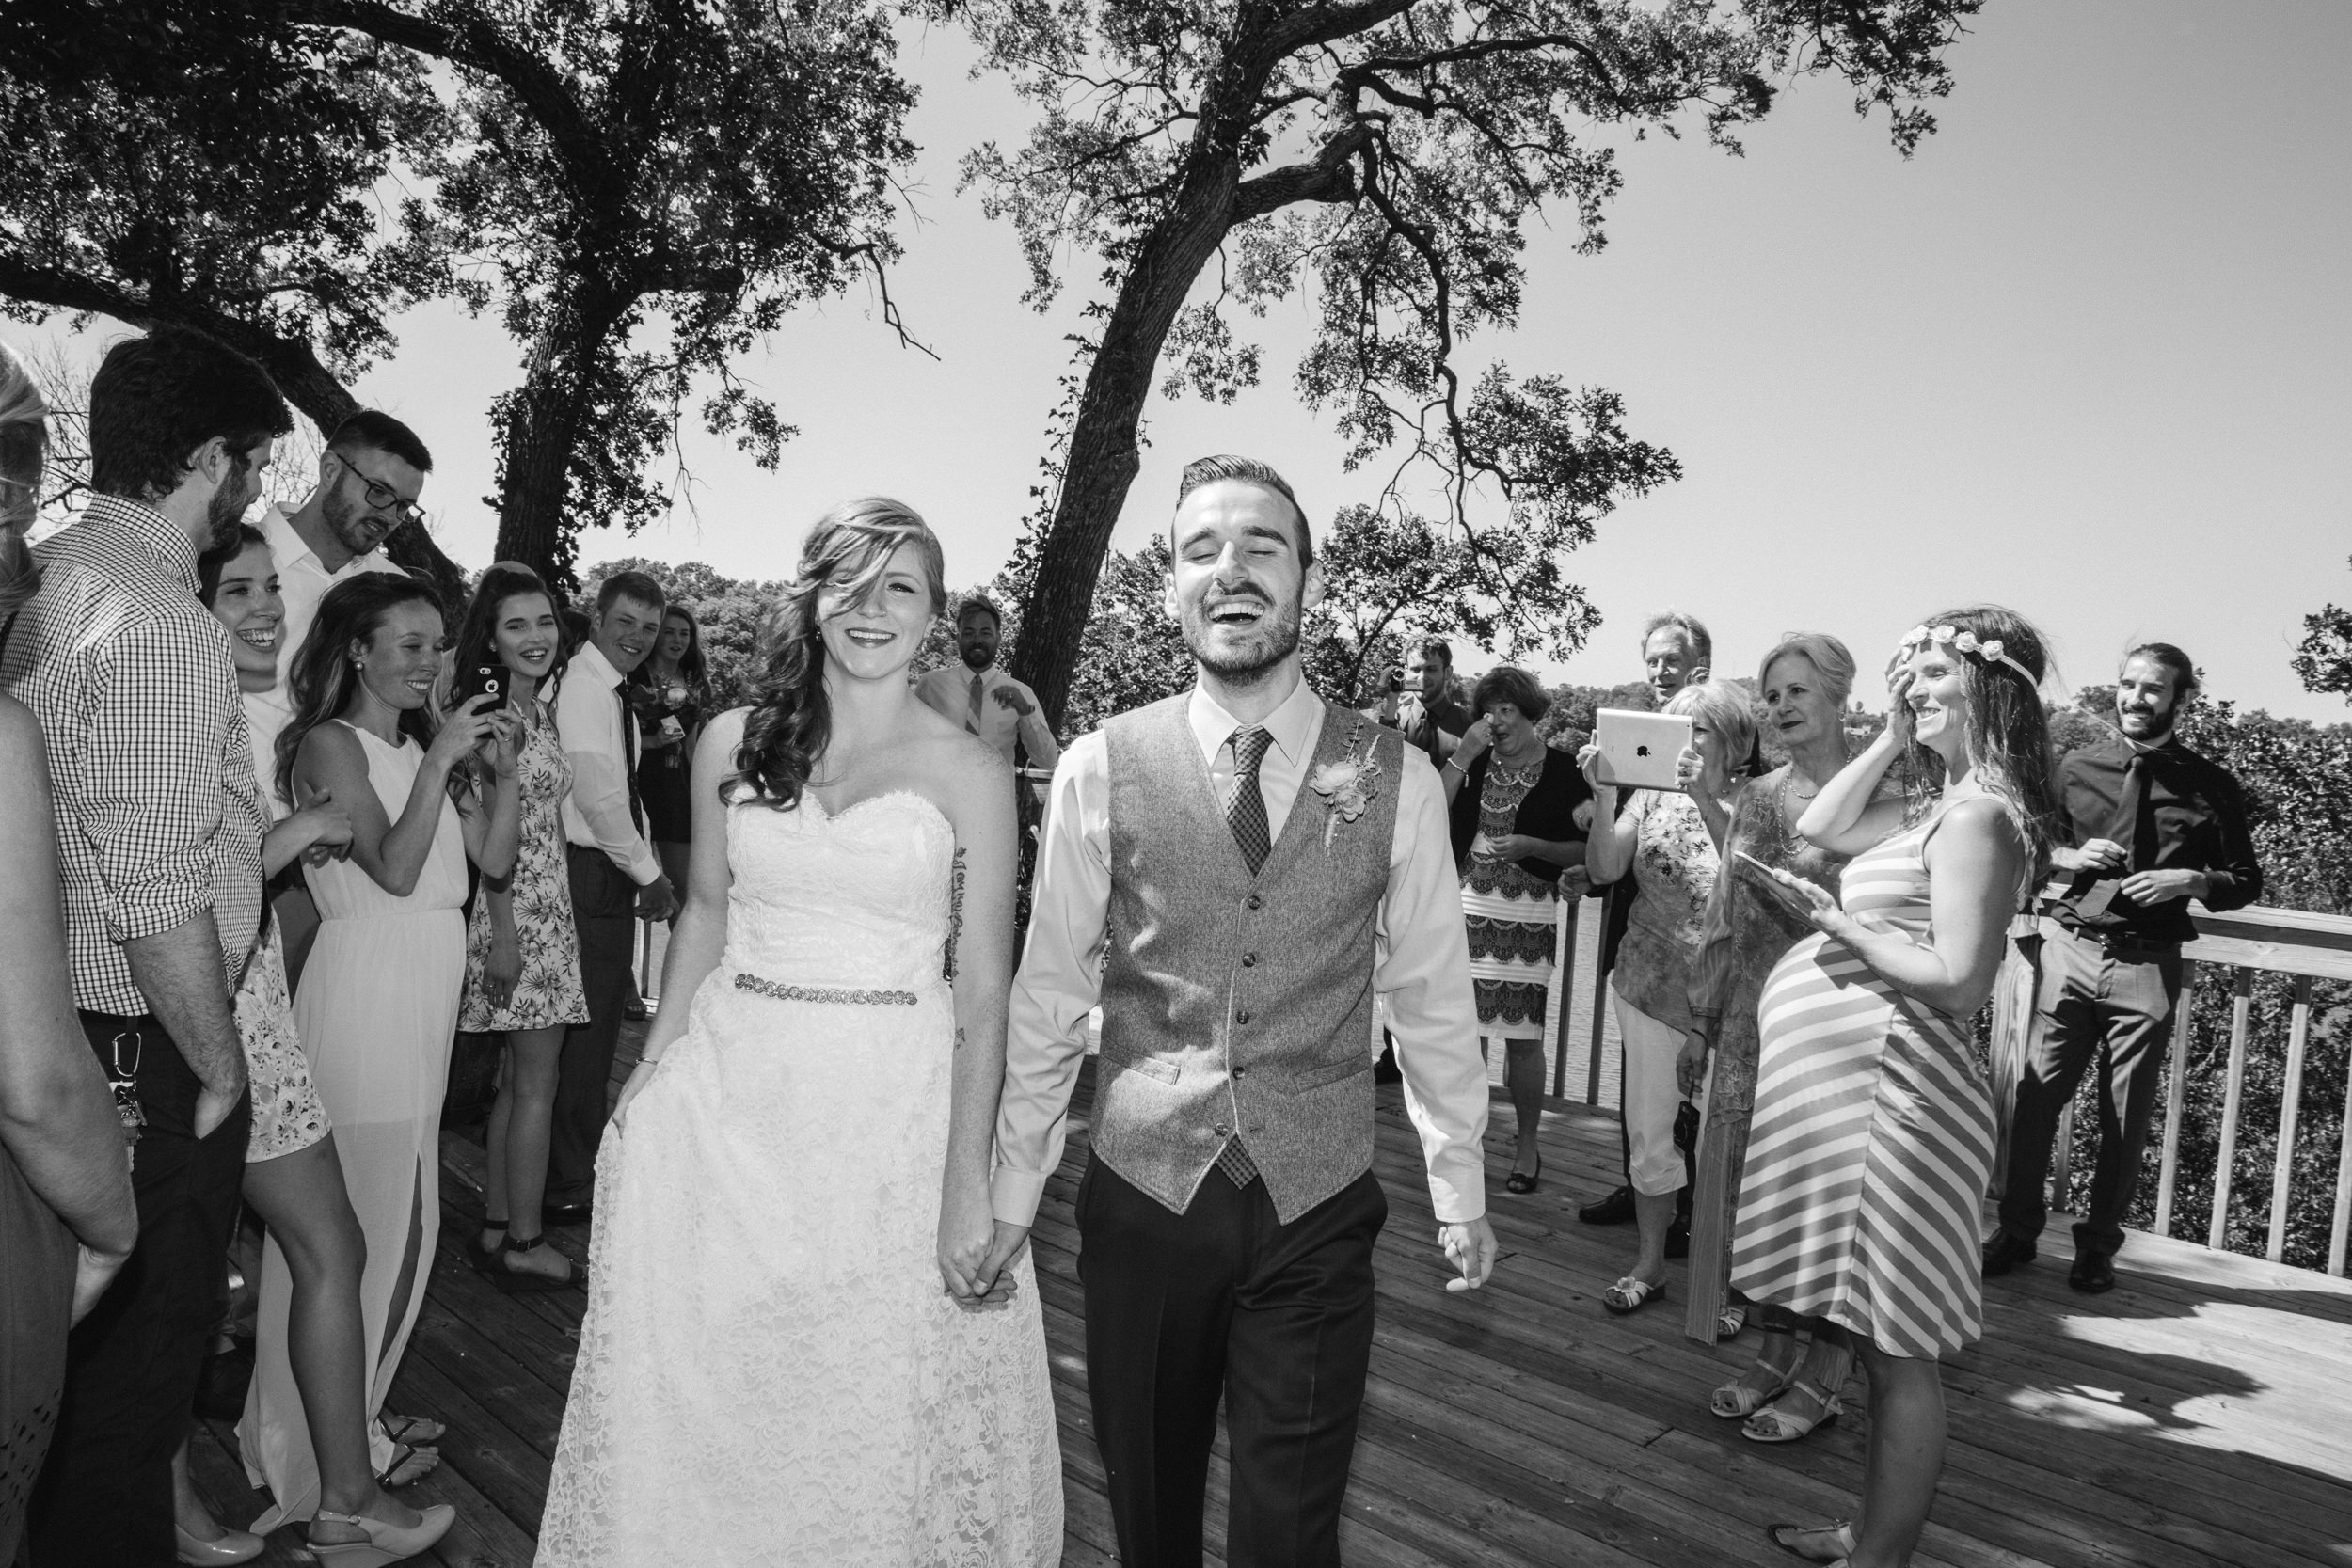 7-25-2015 Sarah and Jimmy's Eagle Ridge Downtown Galena Wedding-156.jpg